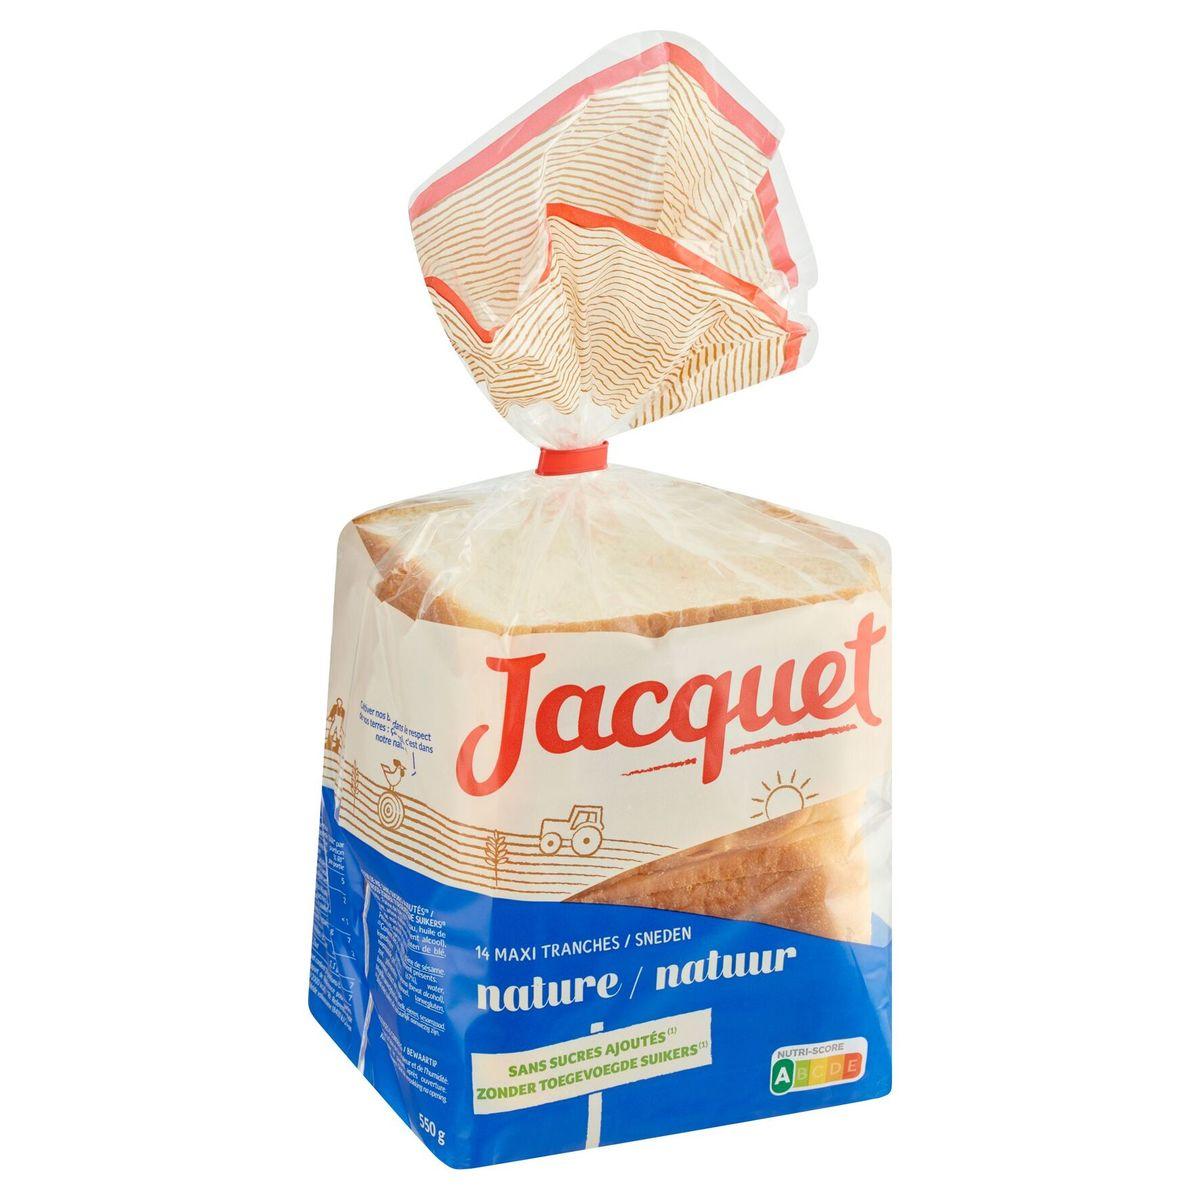 Jacquet Nature 14 Maxi Tranches 550 g